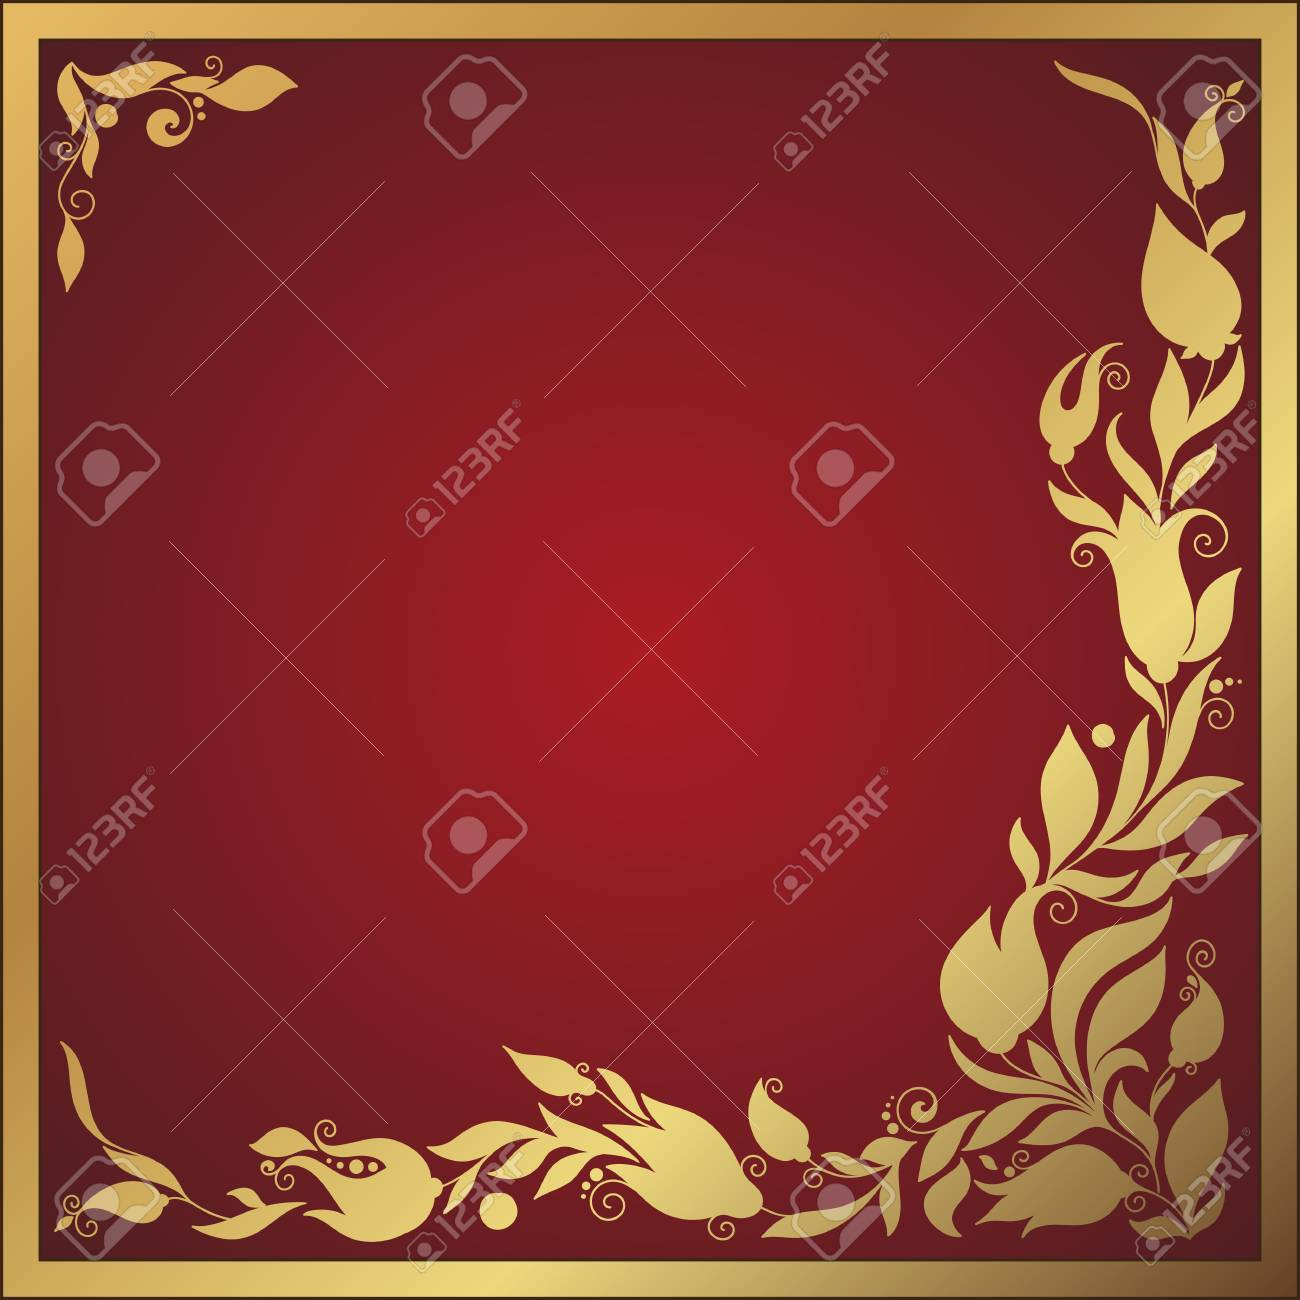 Greeting Frame Elements For Design. Vector Illustration. Bright ...